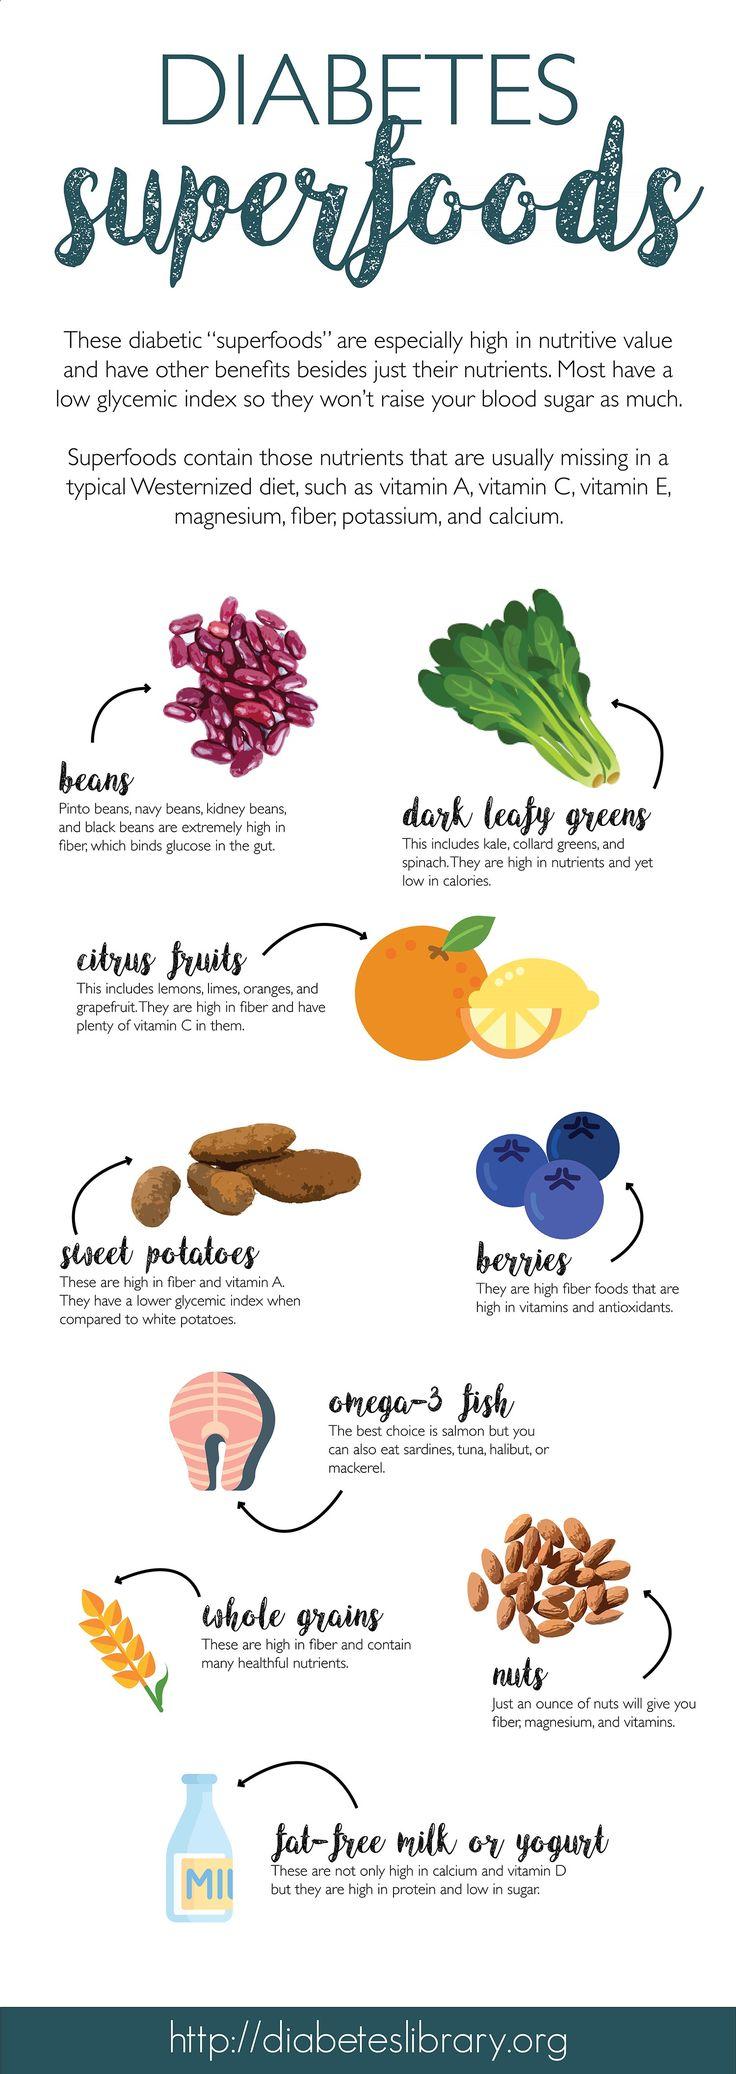 Best 25+ Diabetic food list ideas on Pinterest | Carb list ...